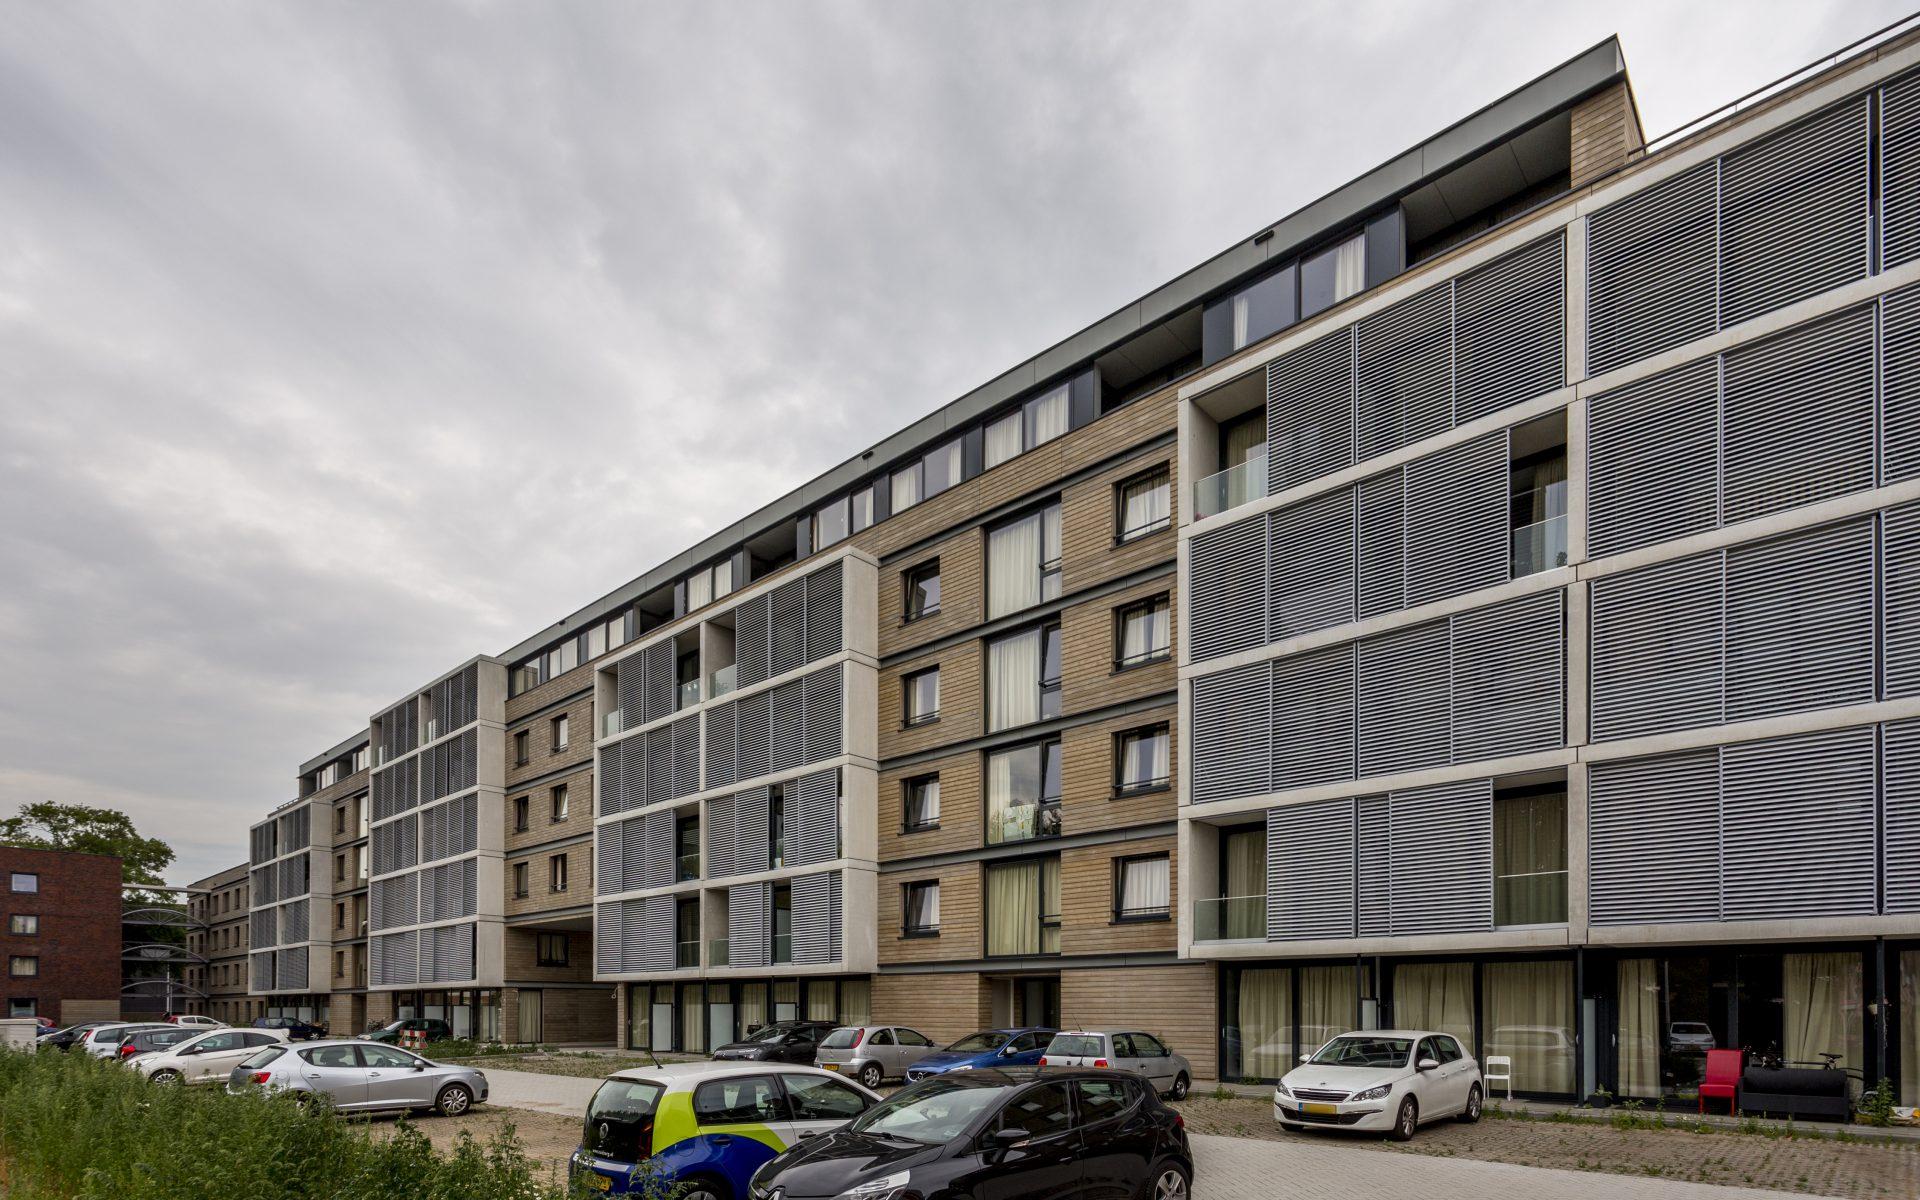 New apartment block Boutenslaan, Eindhoven